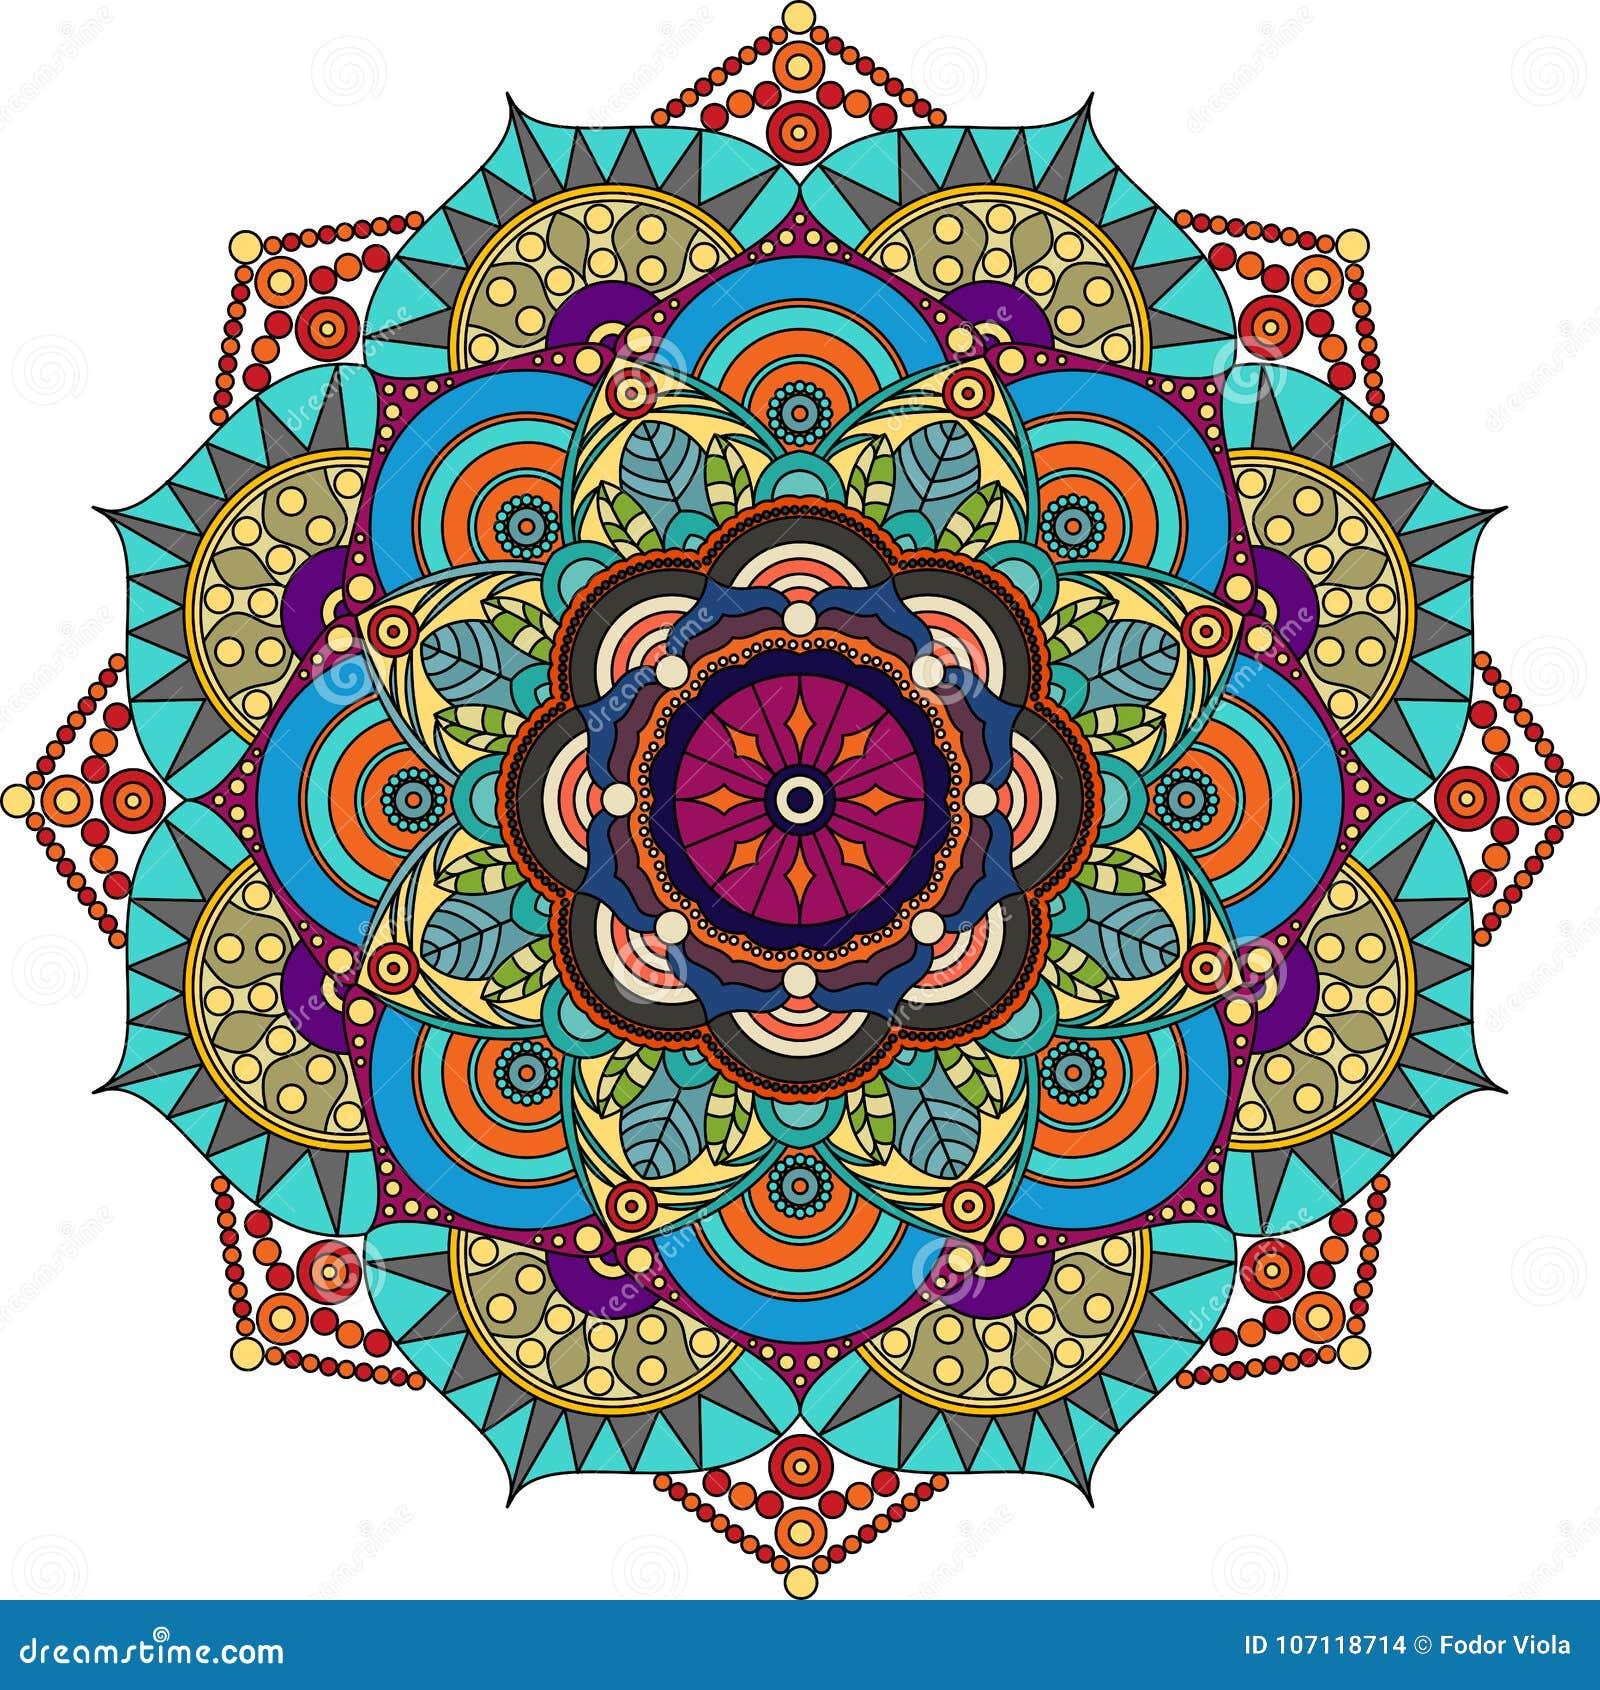 Mandala colorida, púrpura, verde, gris, colores oro